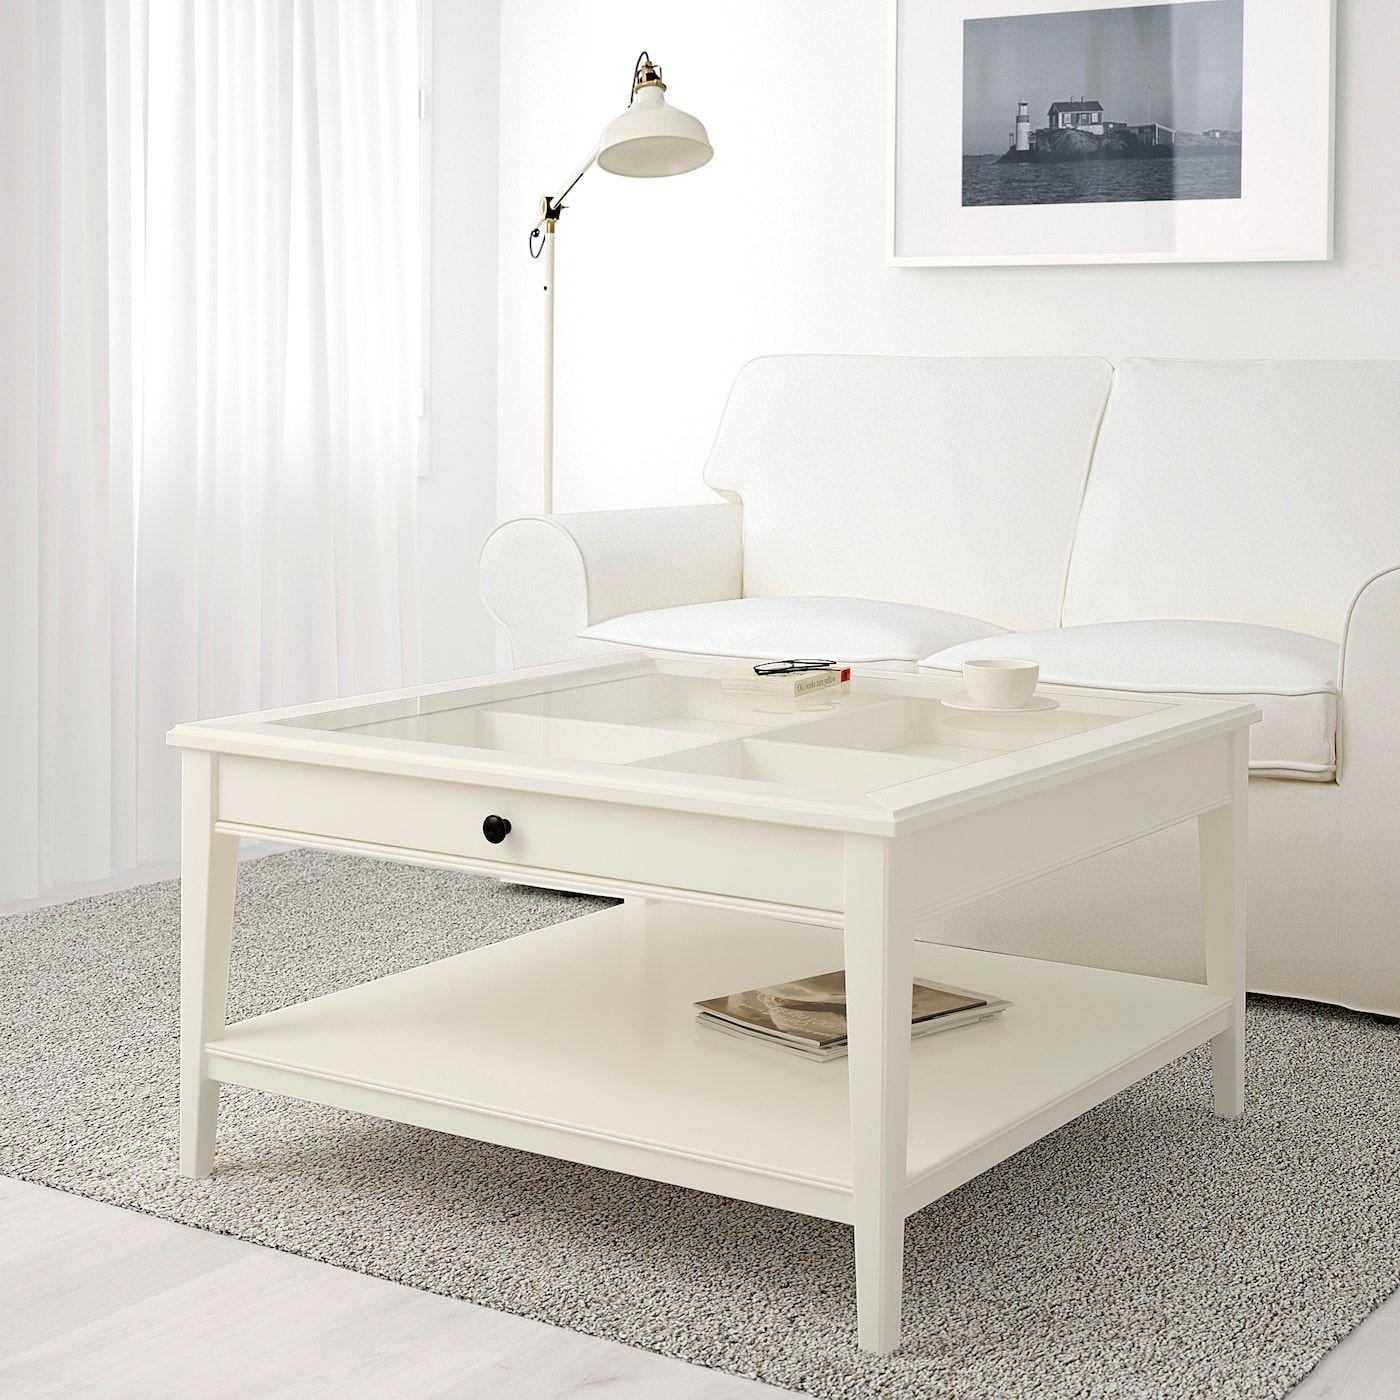 Liatorp Table Basse Blanc Verre 93x93 Cm Ikea En 2021 Table Basse Blanc Table Basse Mobilier De Salon [ 1400 x 1400 Pixel ]